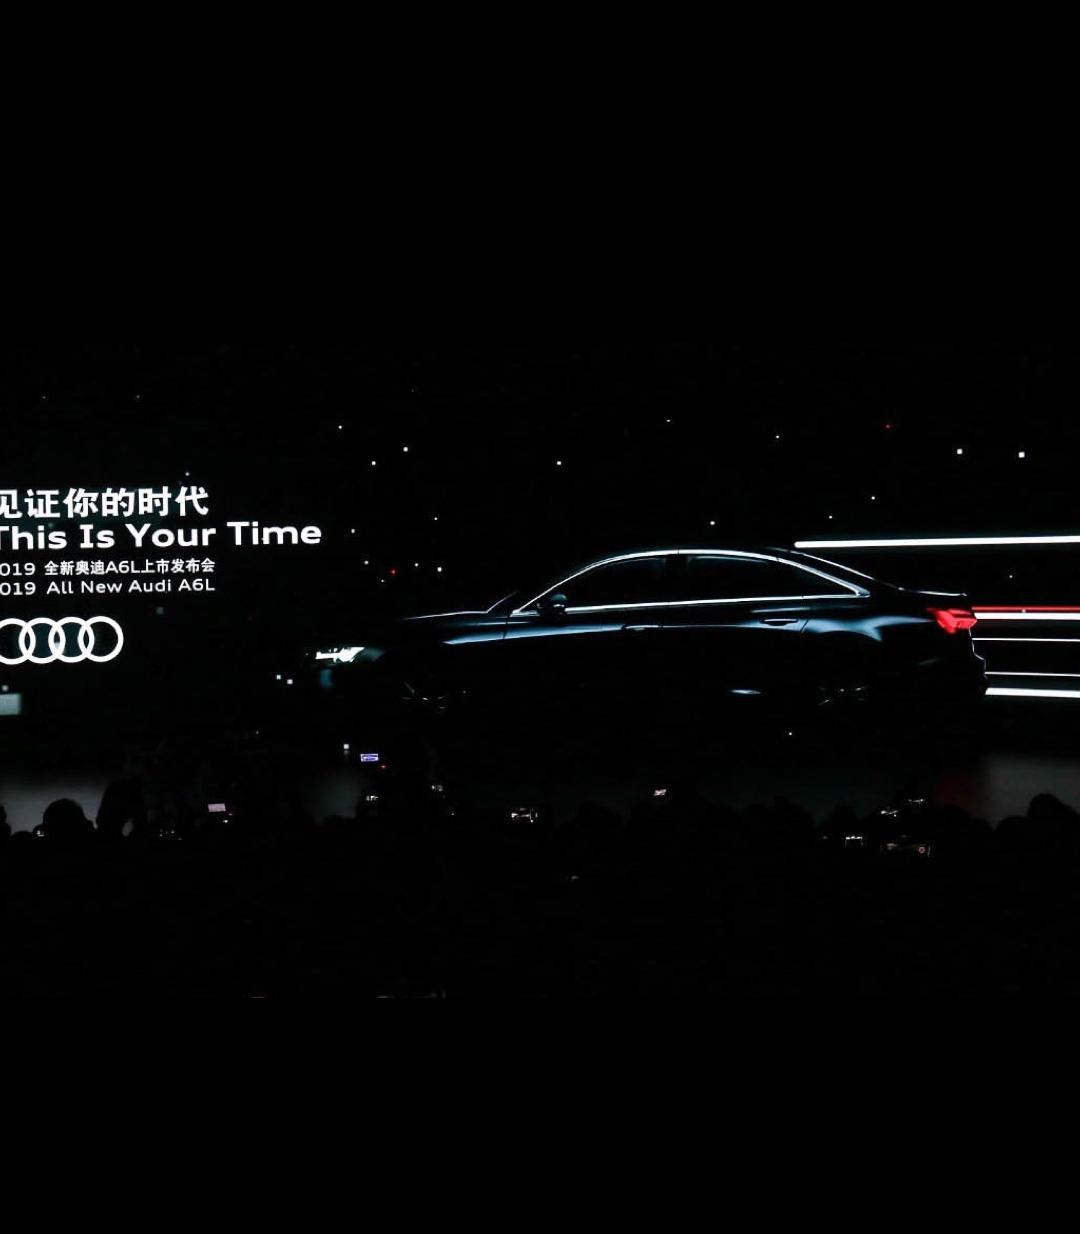 AUDI A6L National Launch Event, China Guangzhou